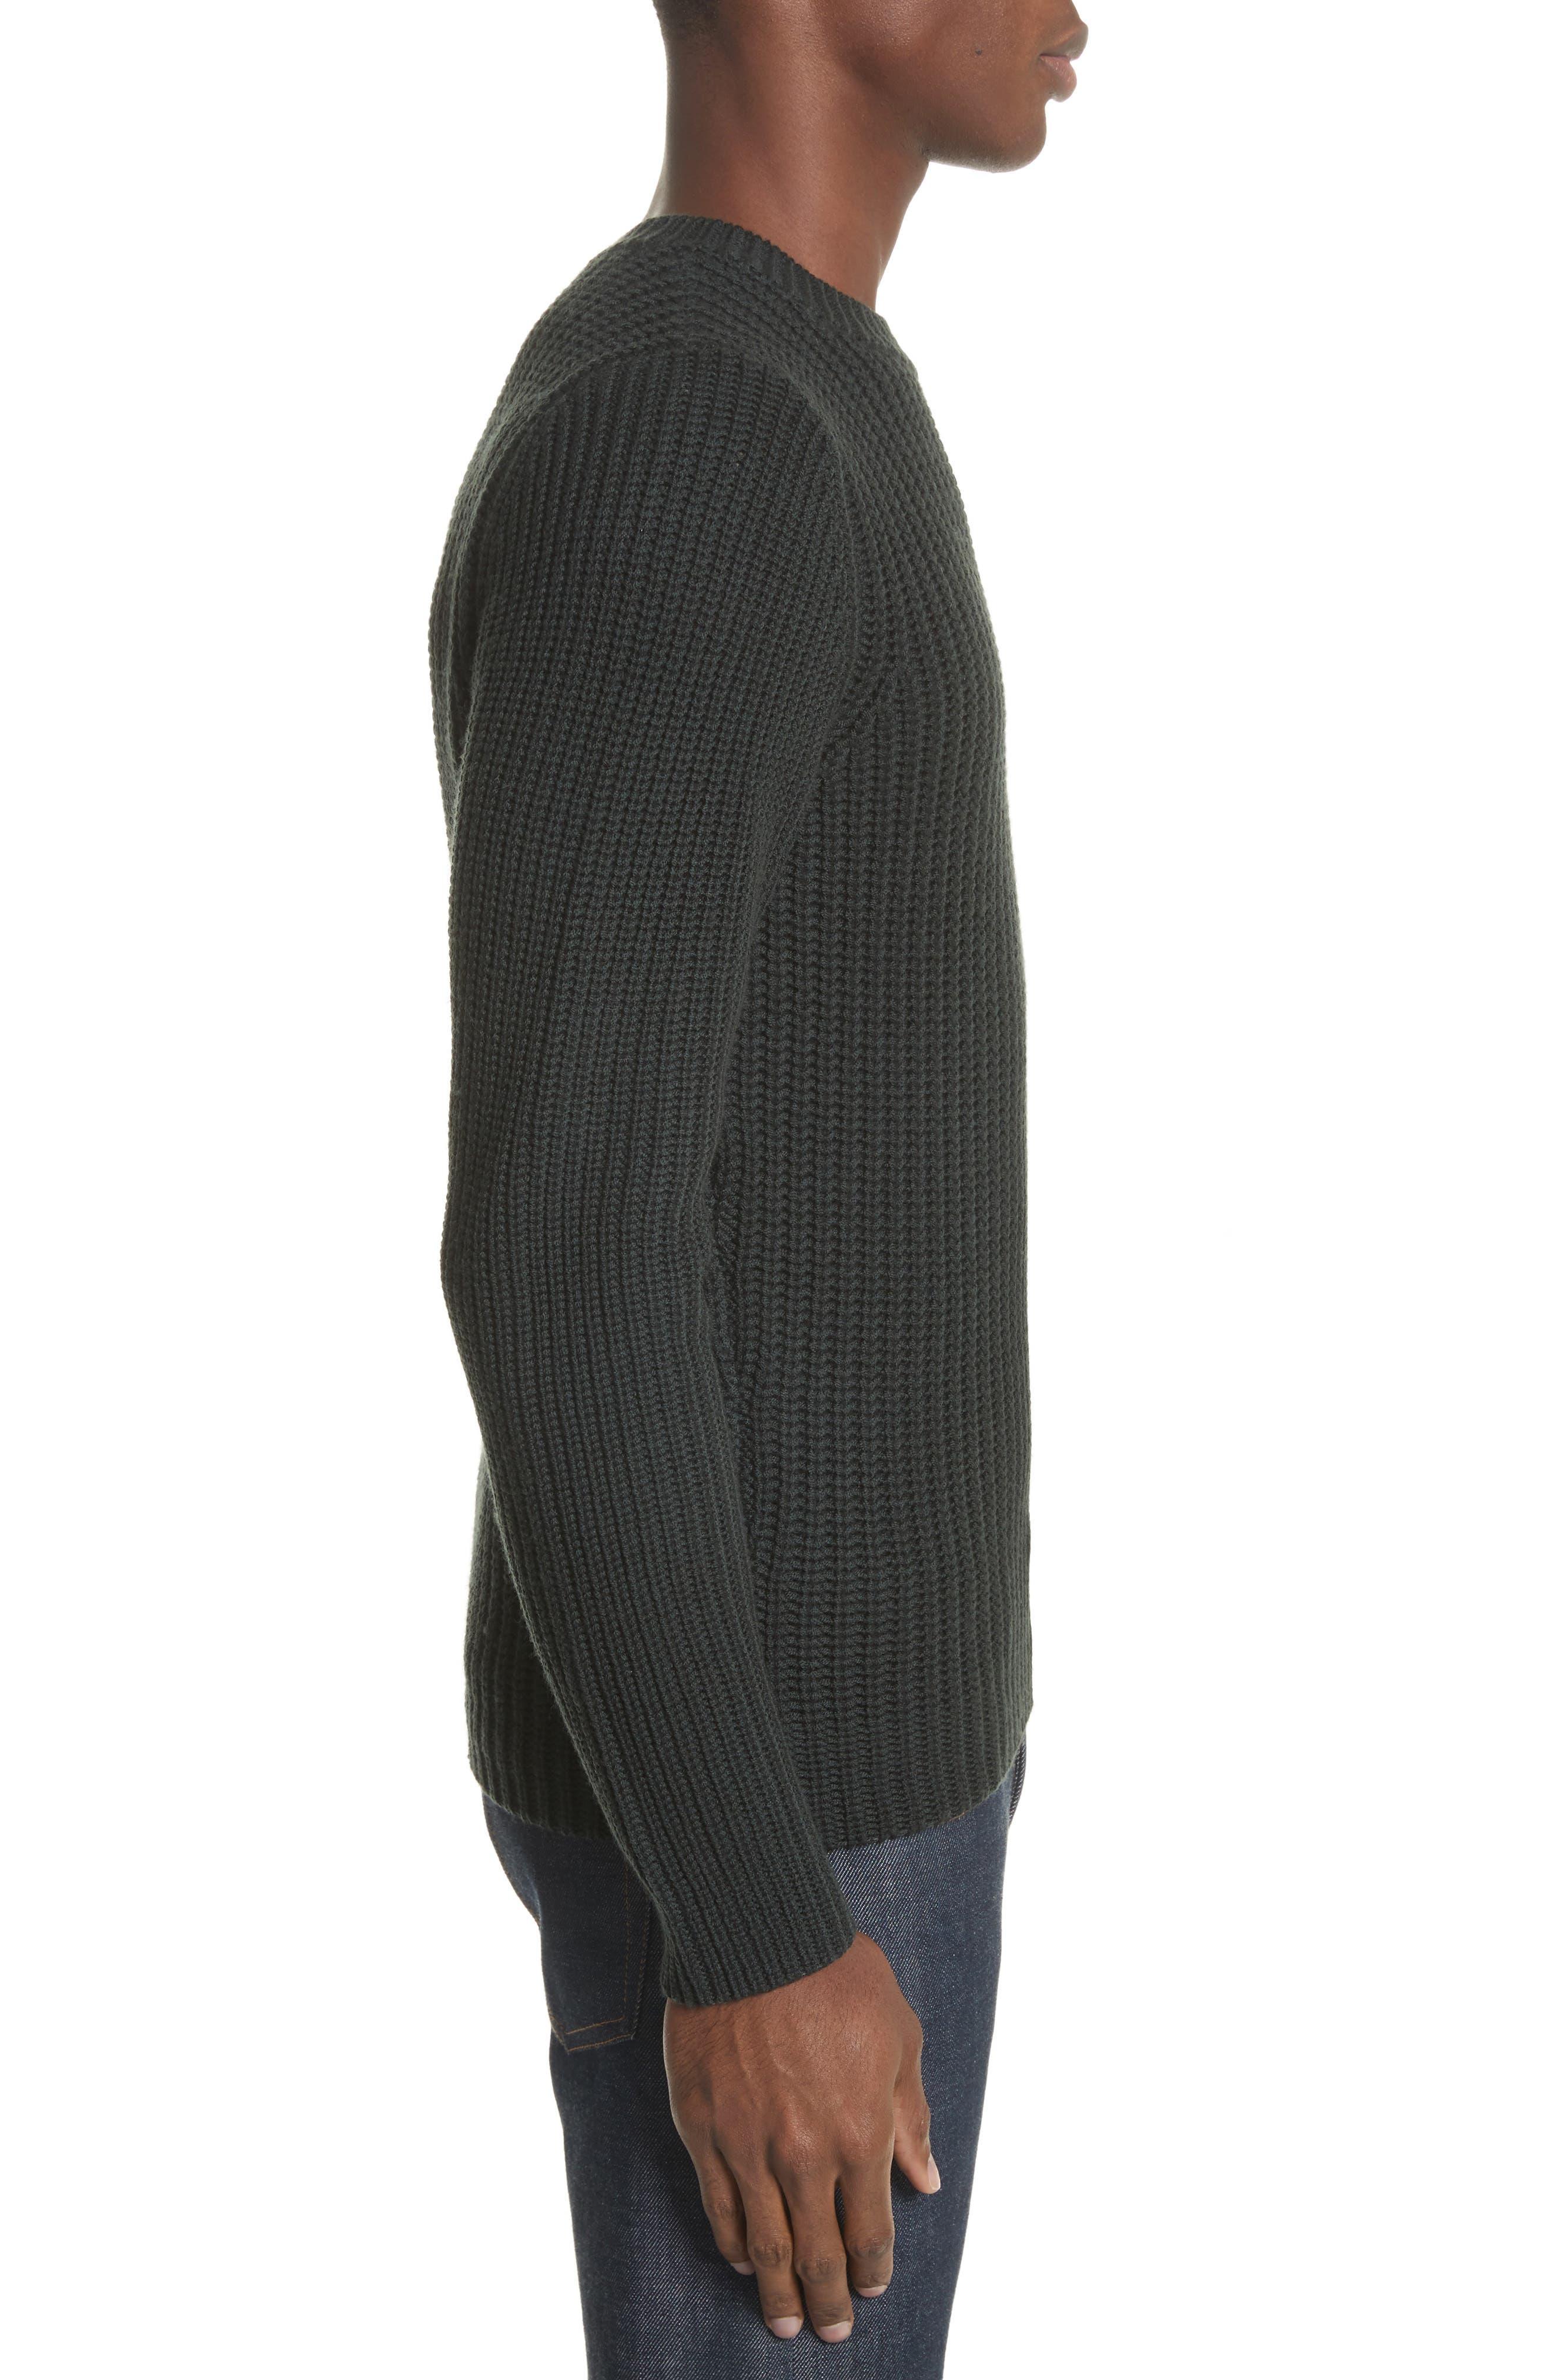 Pull Berger Merino Wool Sweater,                             Alternate thumbnail 3, color,                             Khaki Green